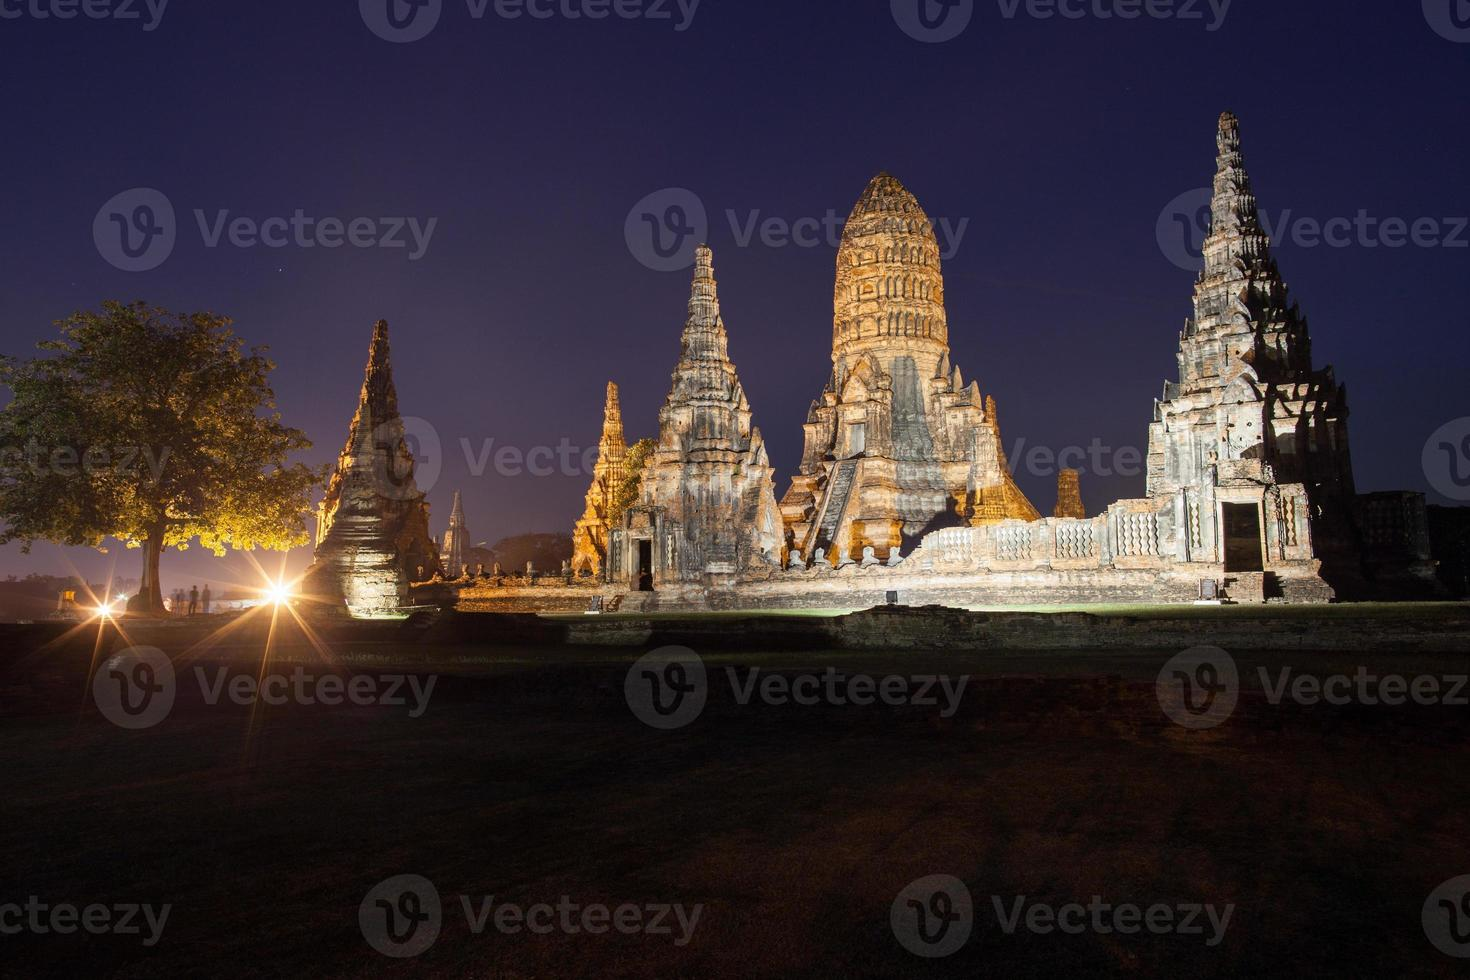 ban pom, thailandia, 2020 - vista notturna del wat chai watthanaram foto